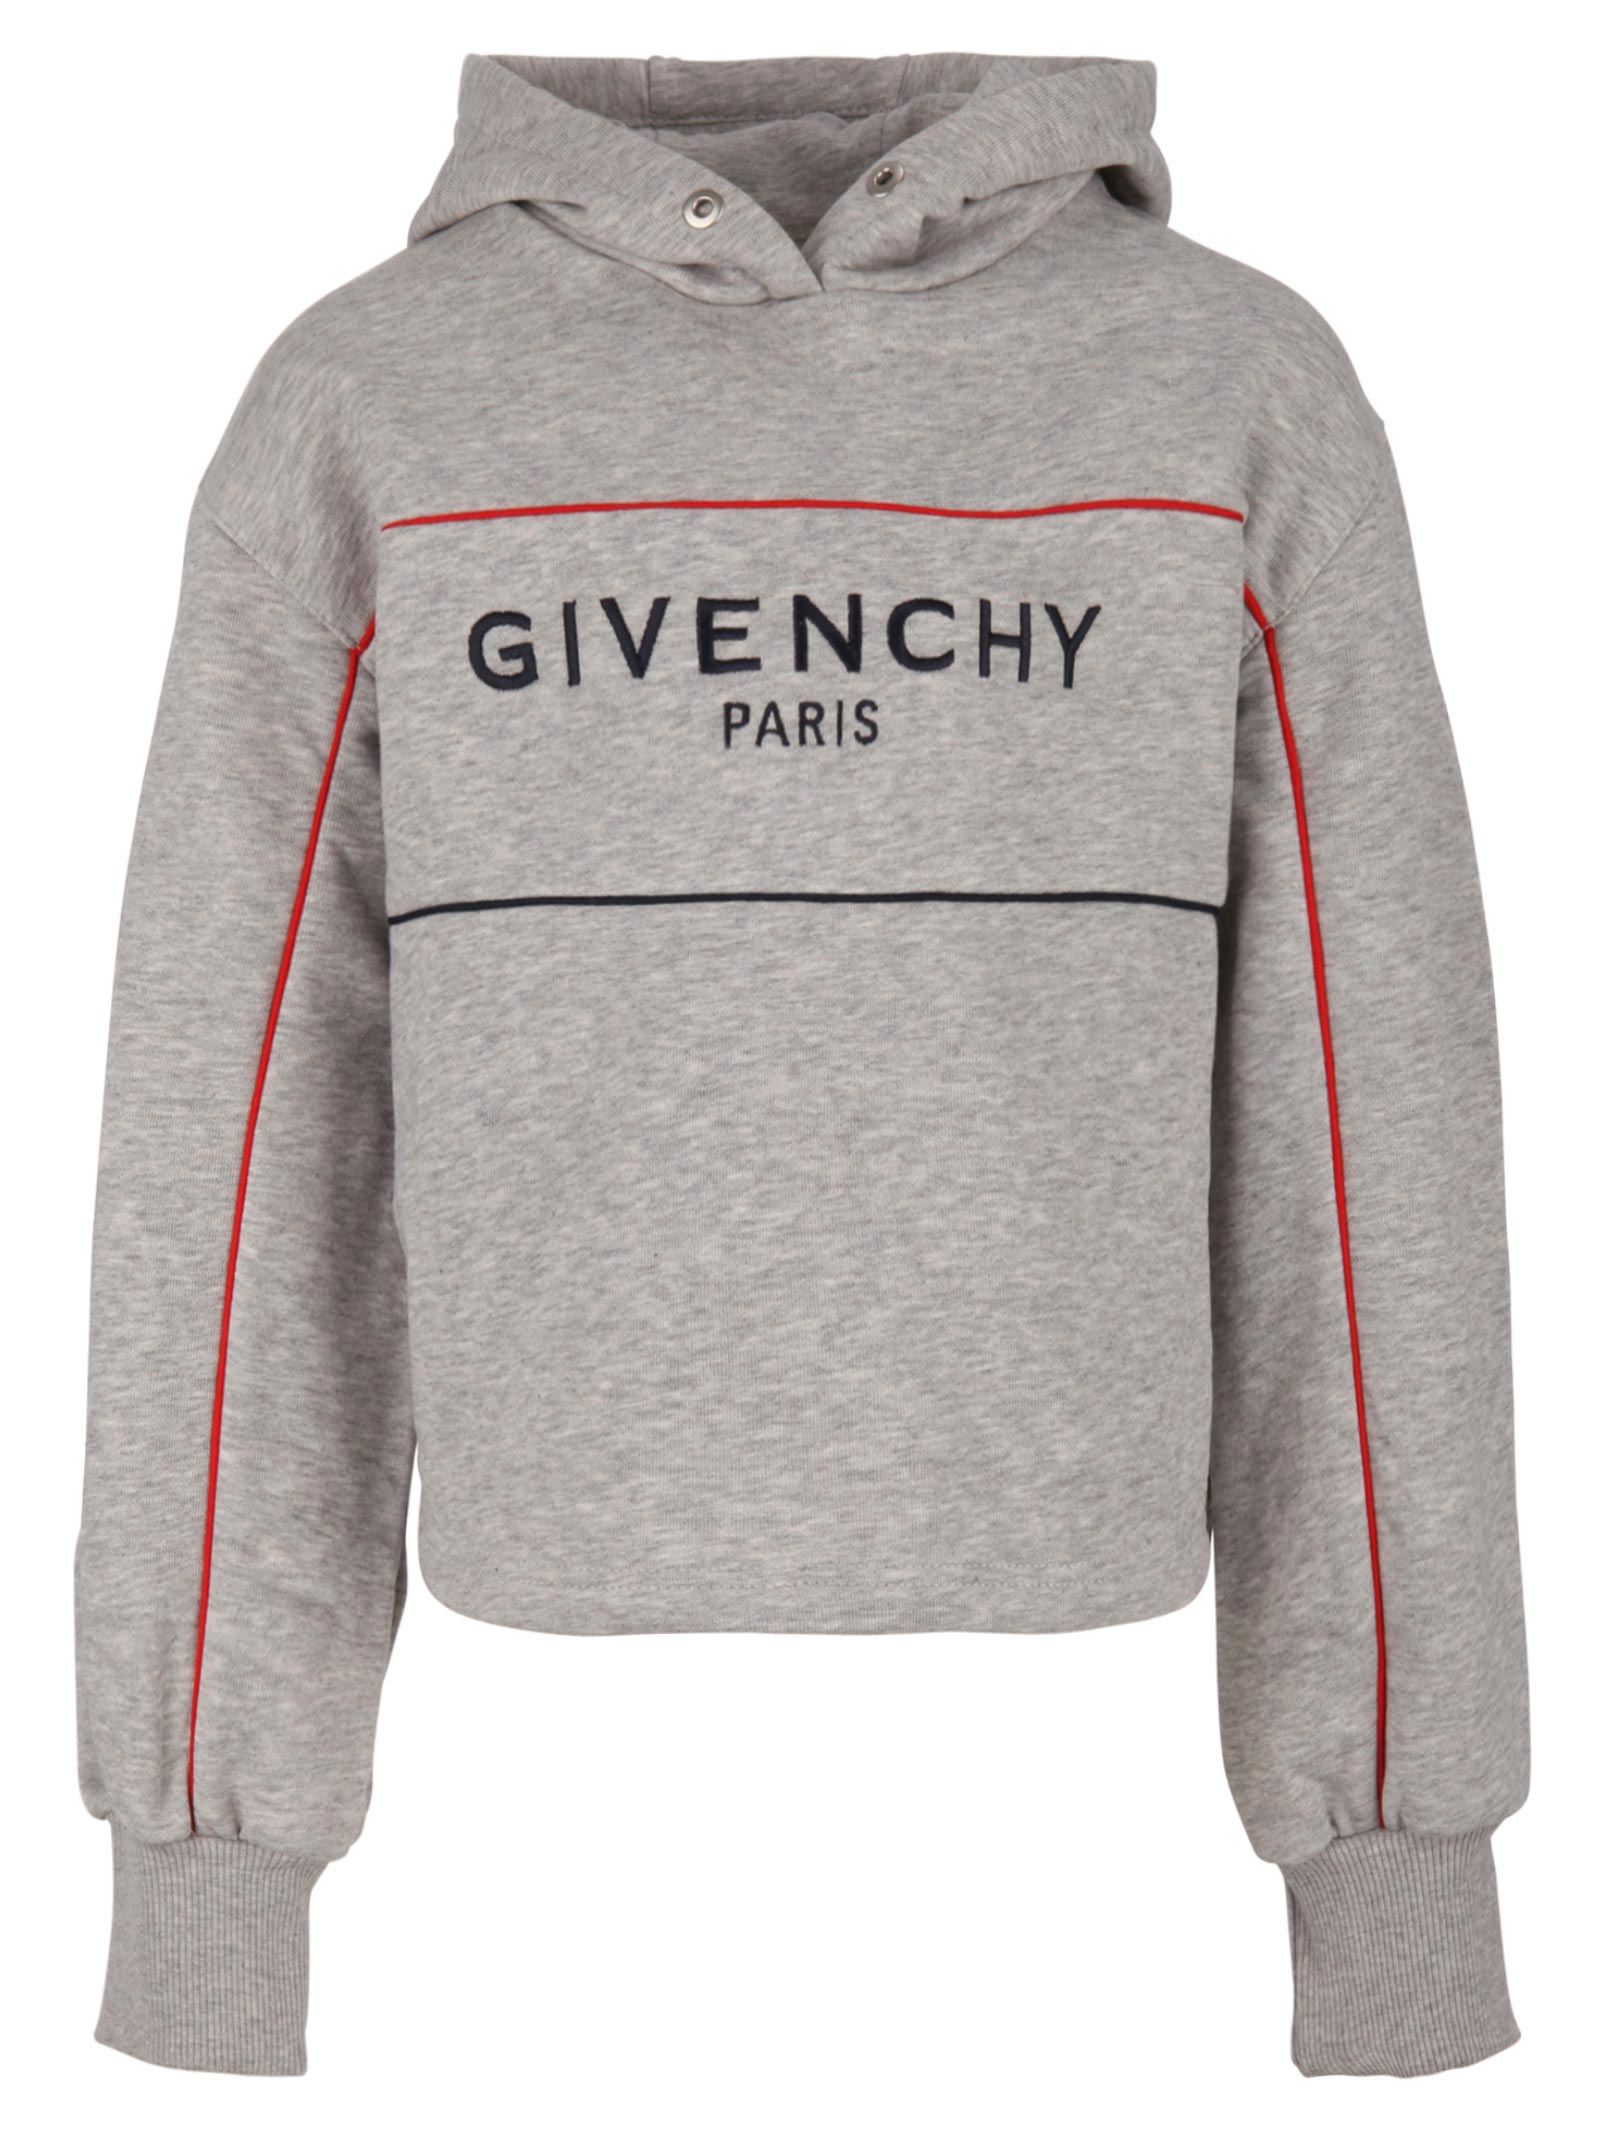 4c75a9566bc5 Givenchy Kids sweatshirt - GIVENCHY kids - Michele Franzese Moda